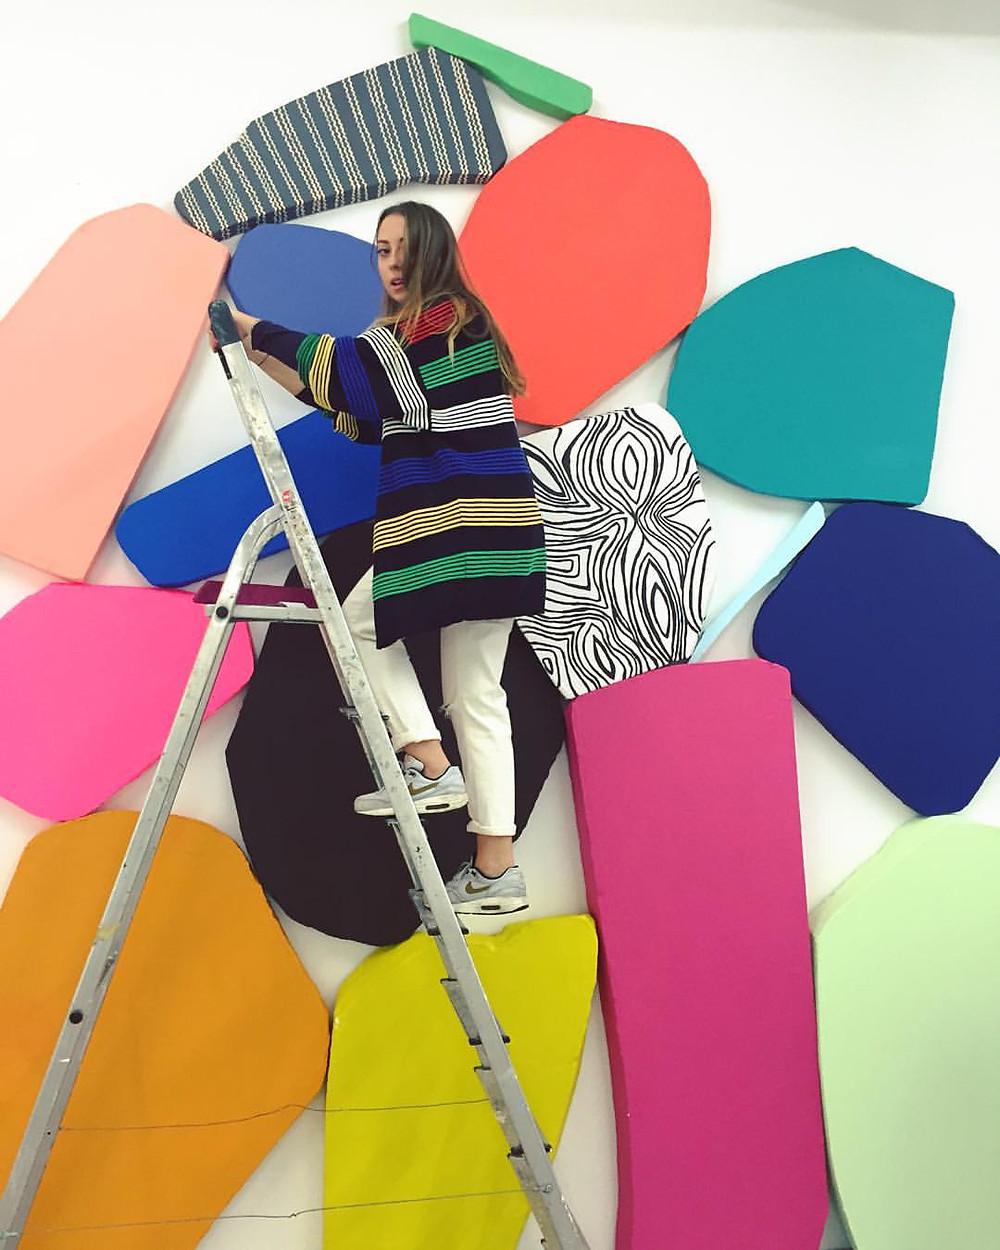 Enterprising: Artist Olivia Hodder exhibits her work www.attollo-art.com